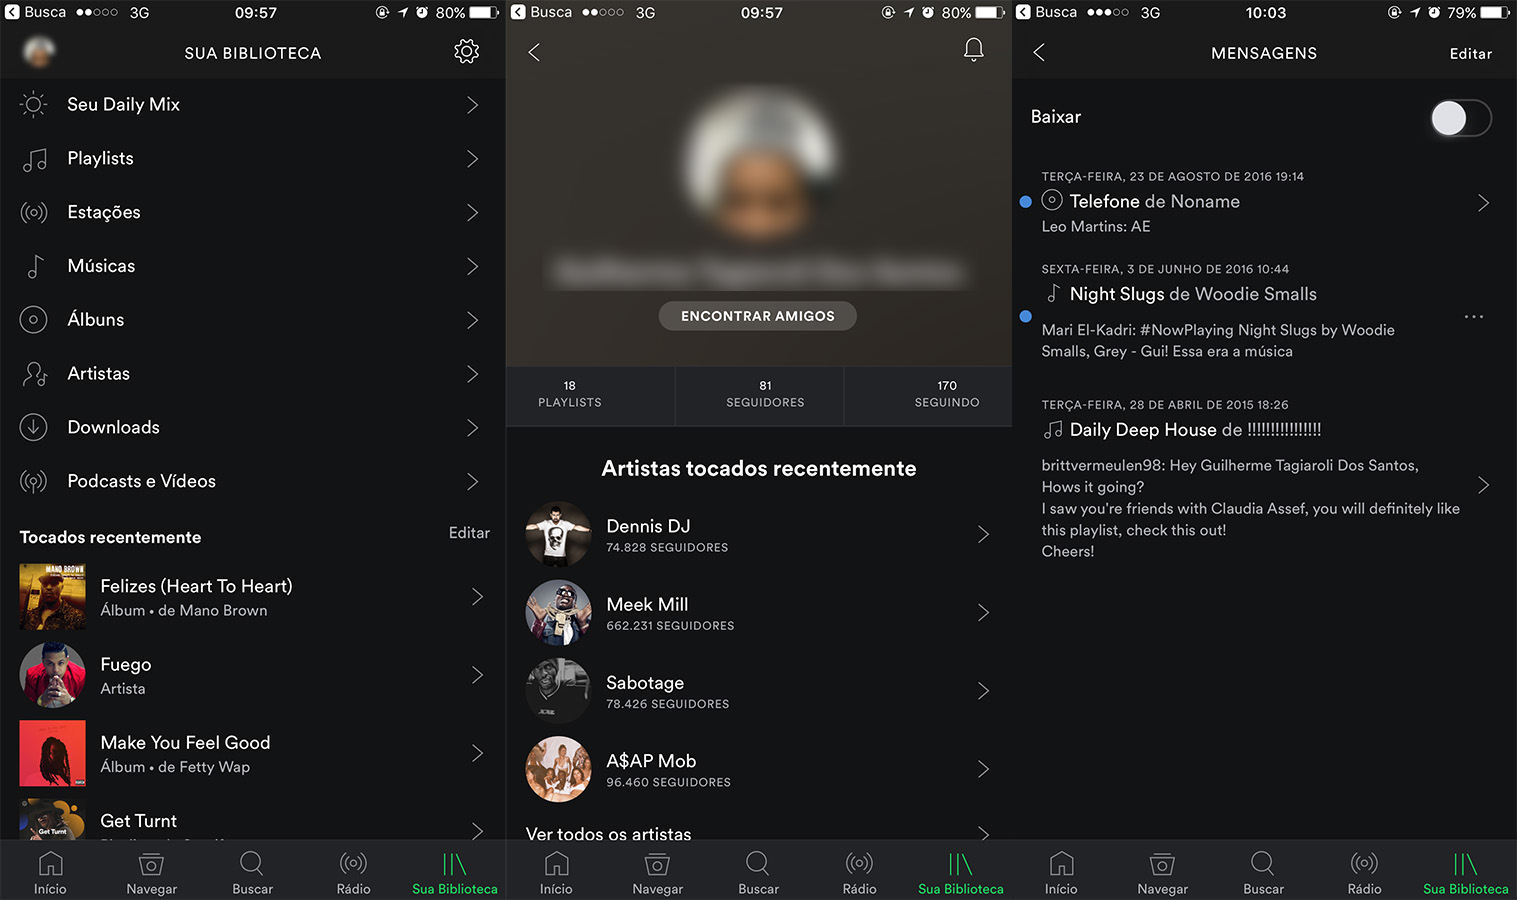 spotify-ios-mensagens